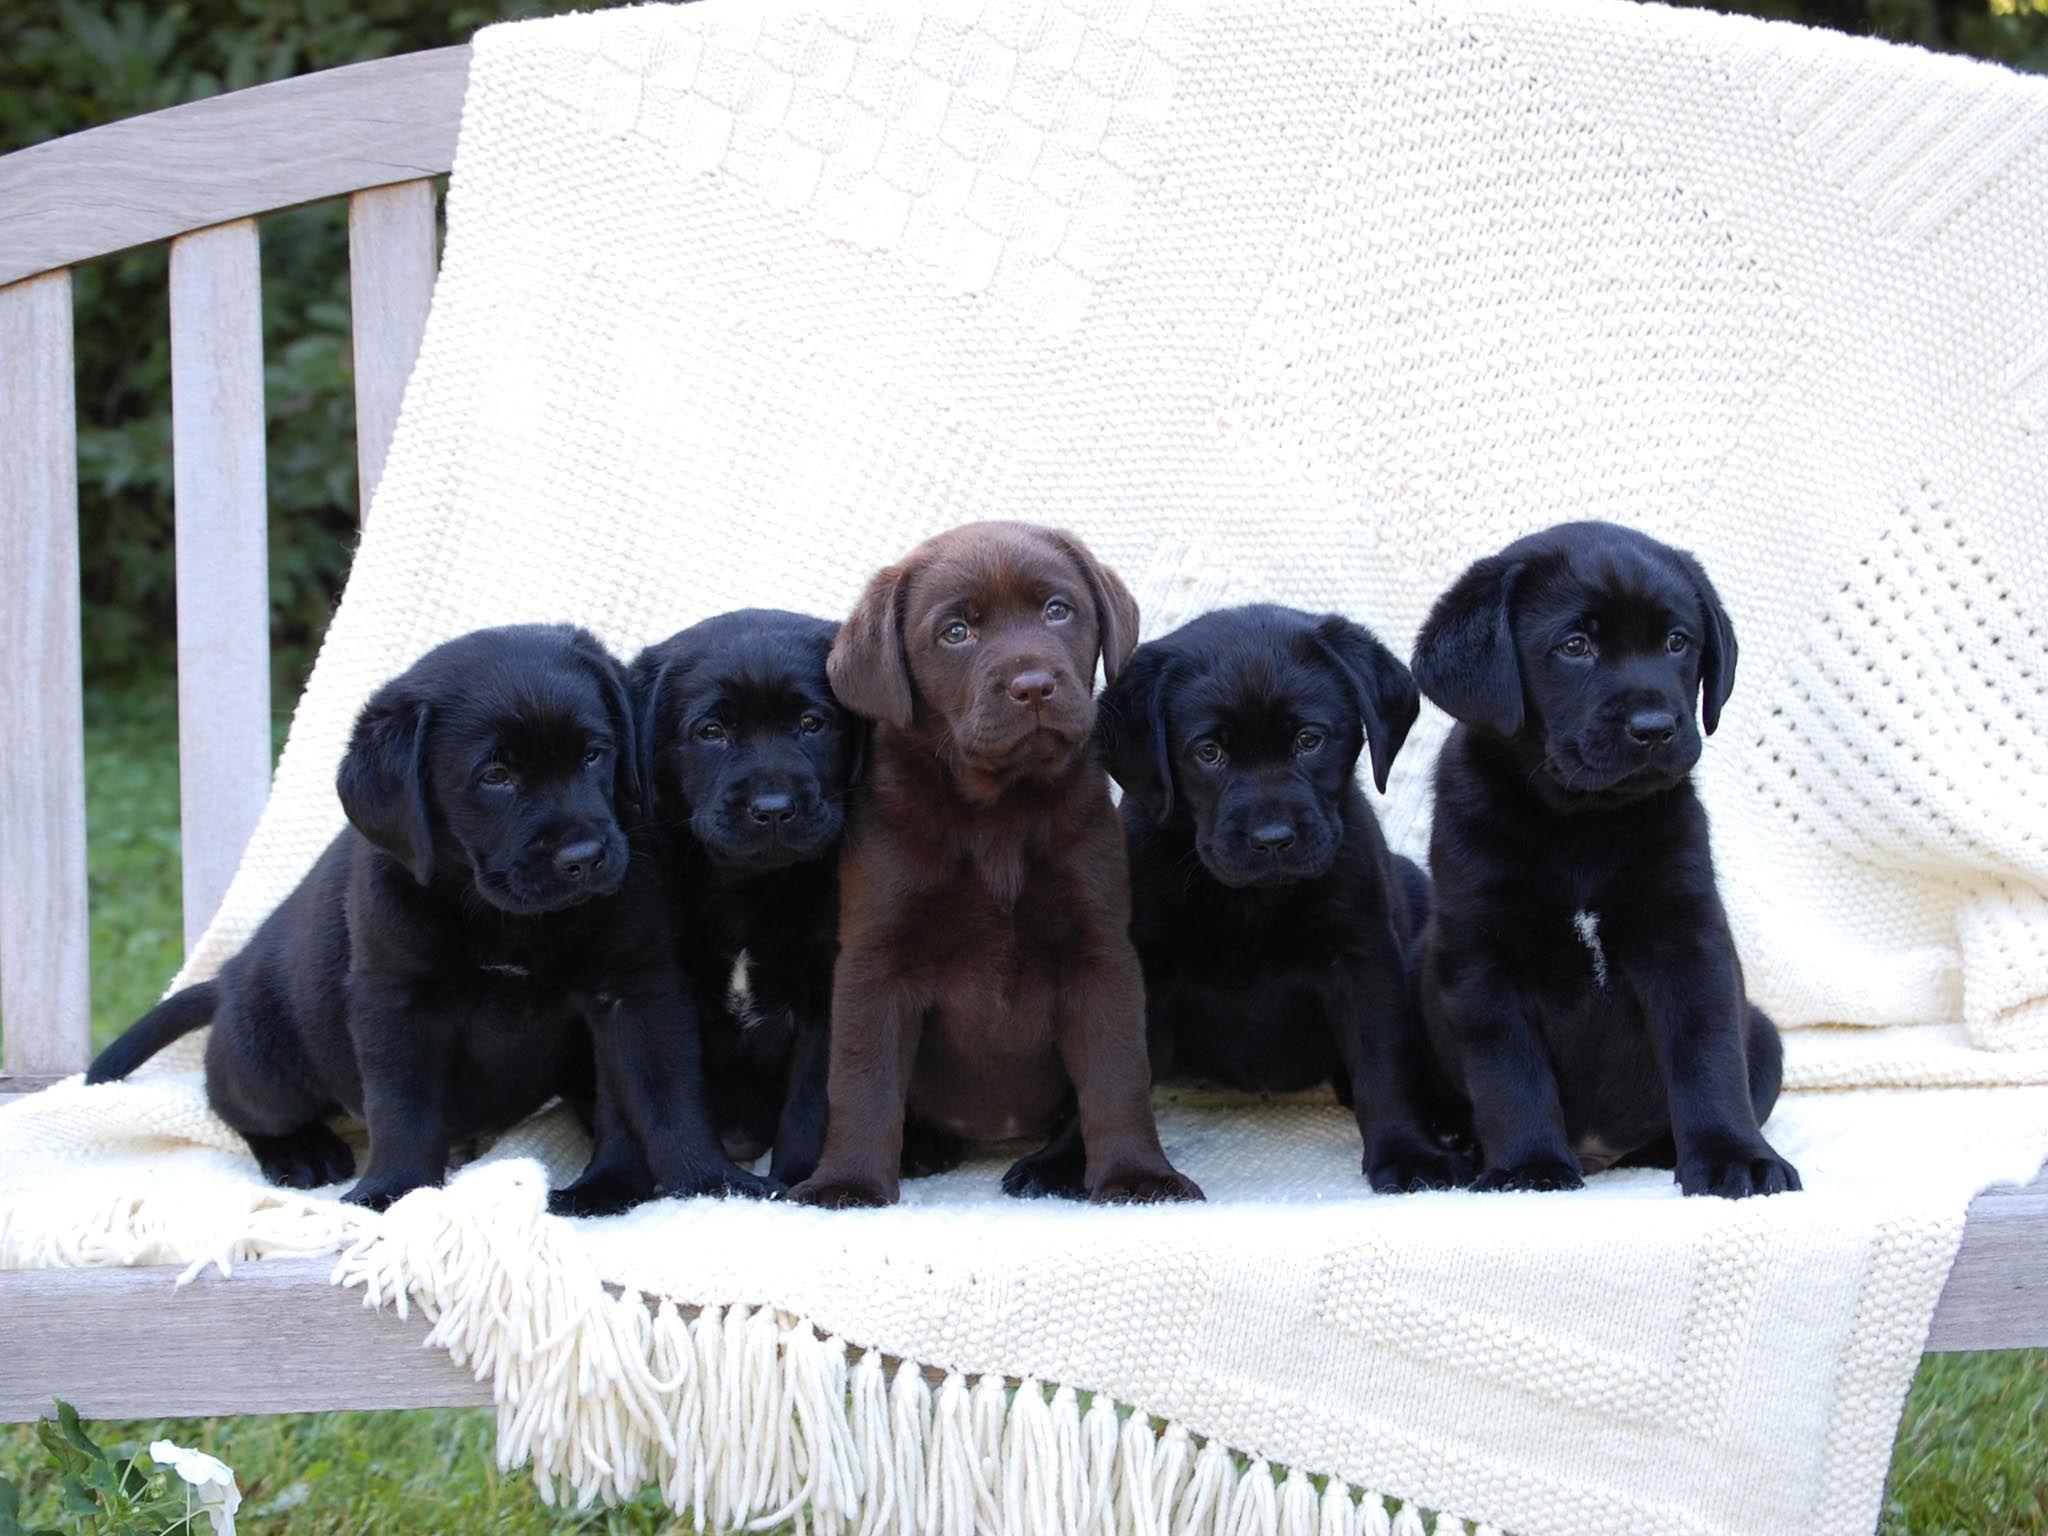 Black Lab Puppy Wallpapers Wallpaper Cave Black Labrador Puppy Labrador Retriever Black Labrador Retriever